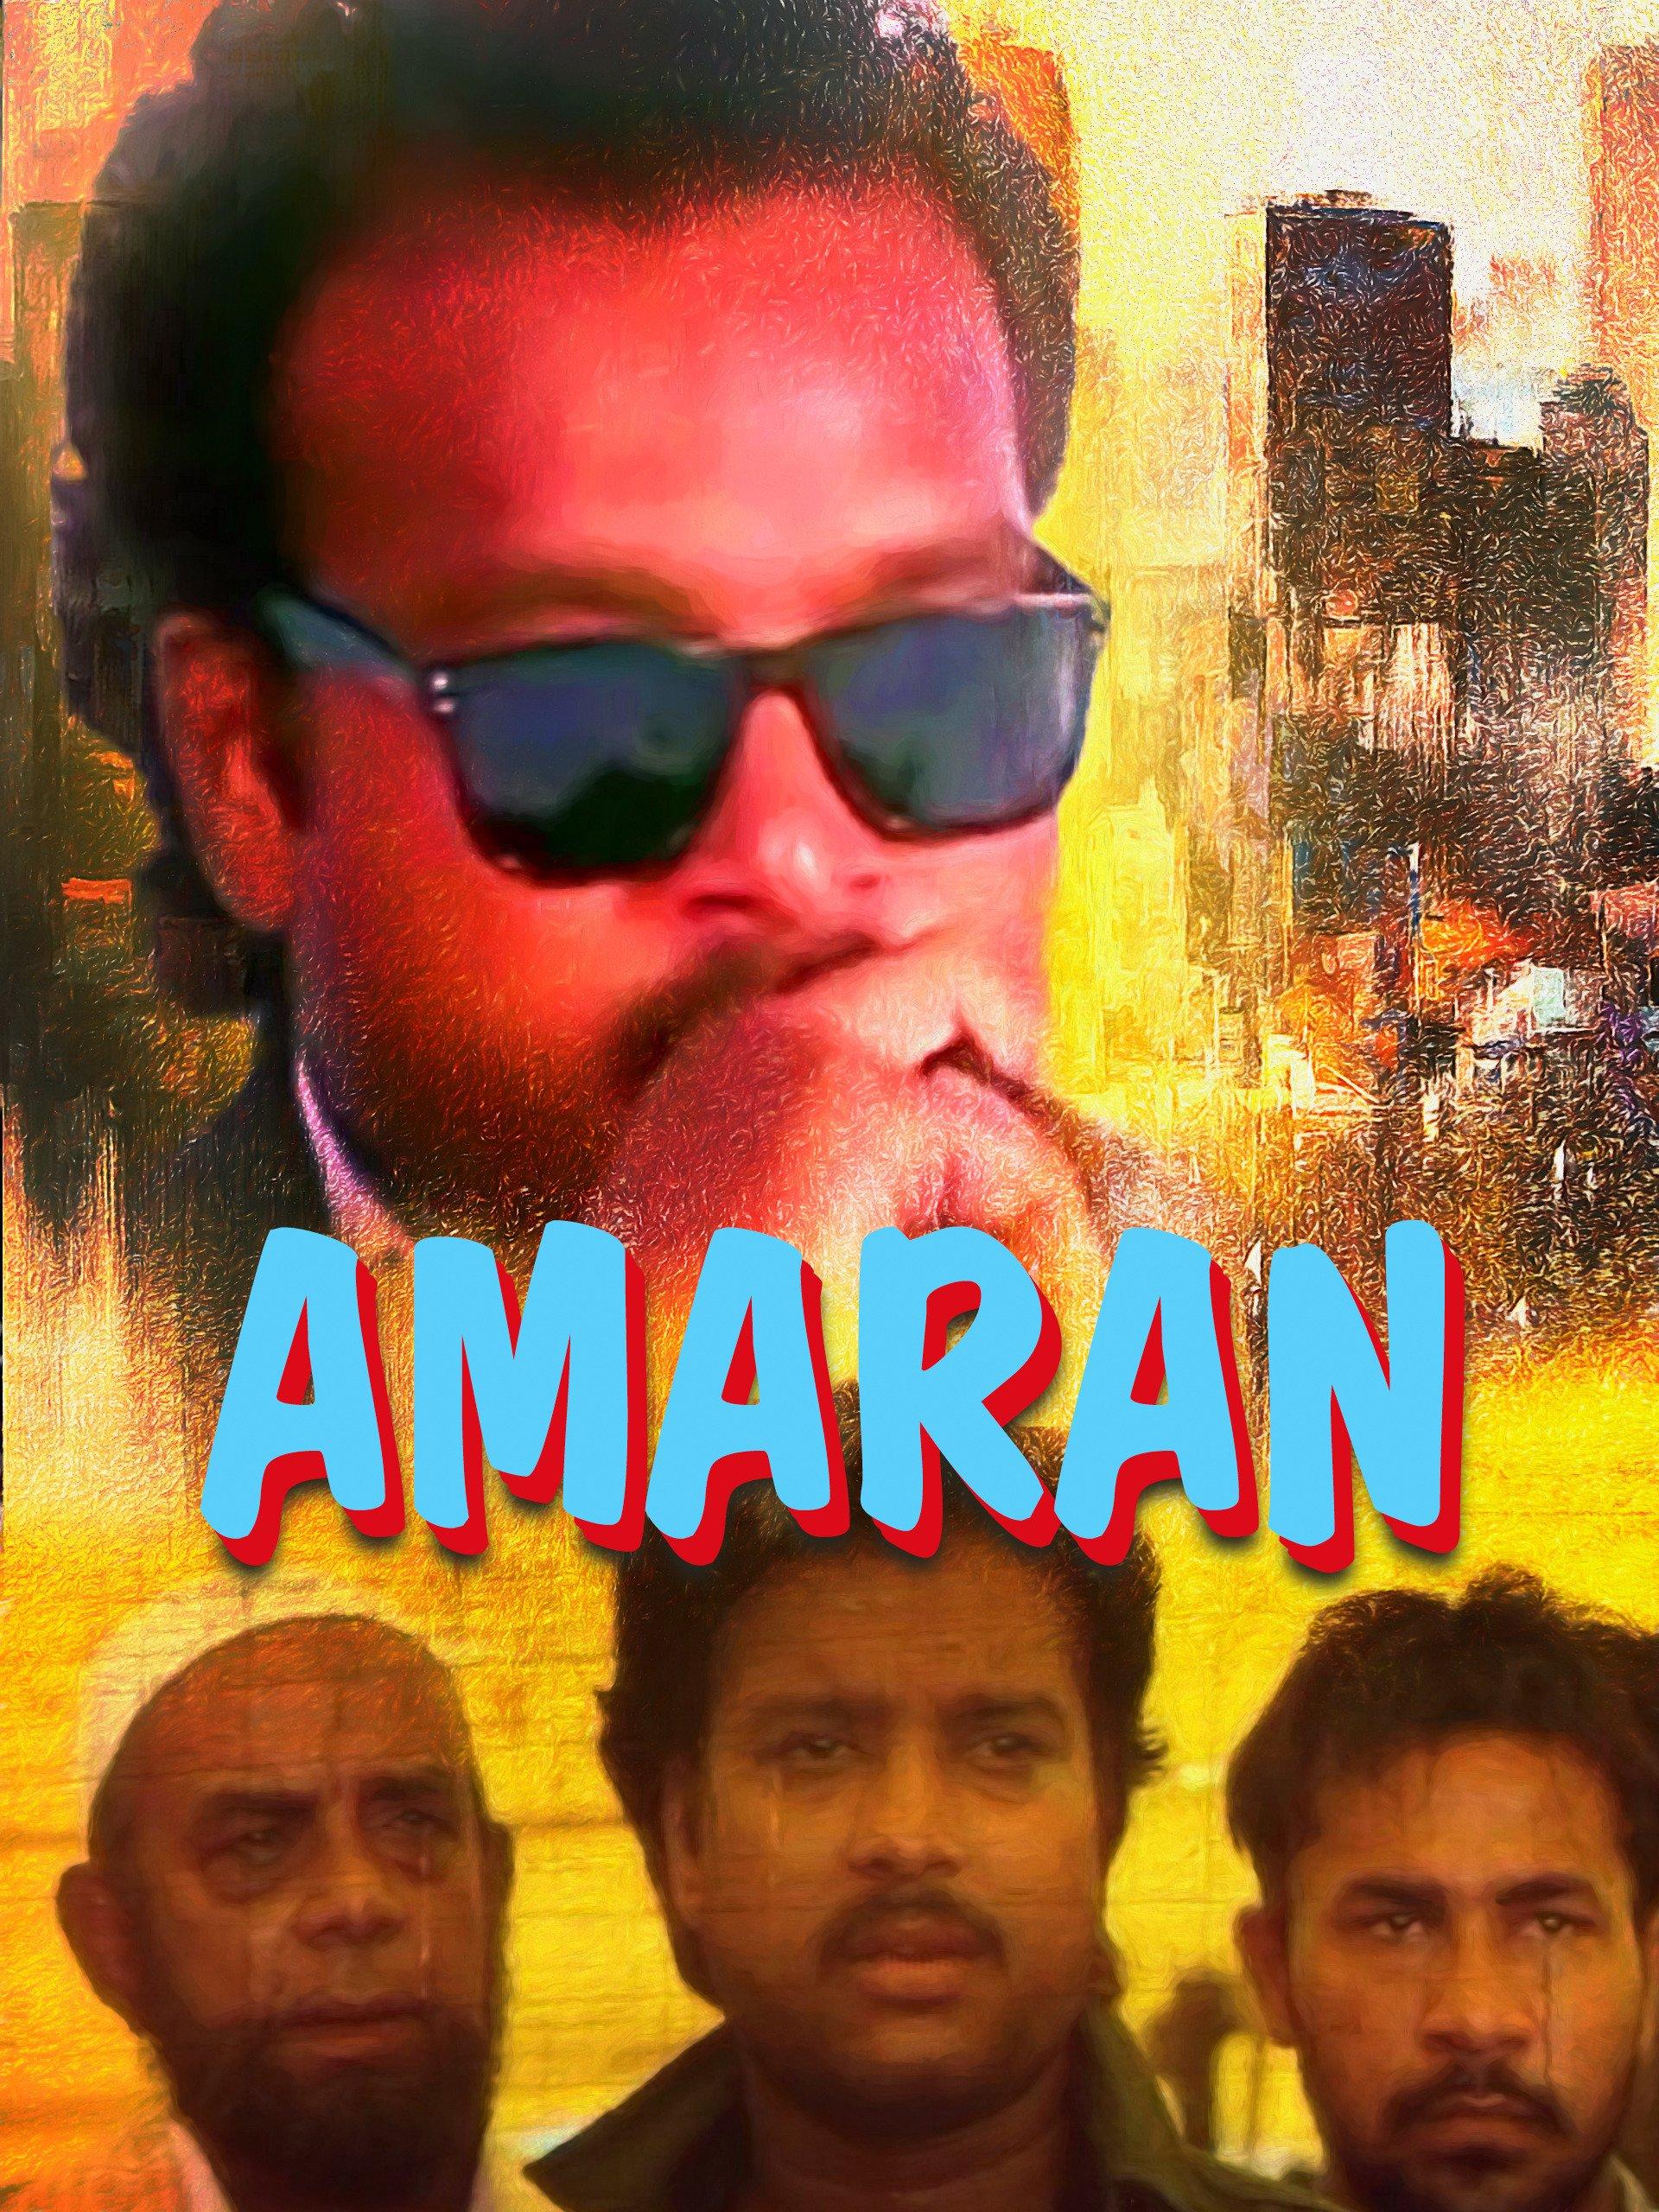 Watch Amaran | Prime Video